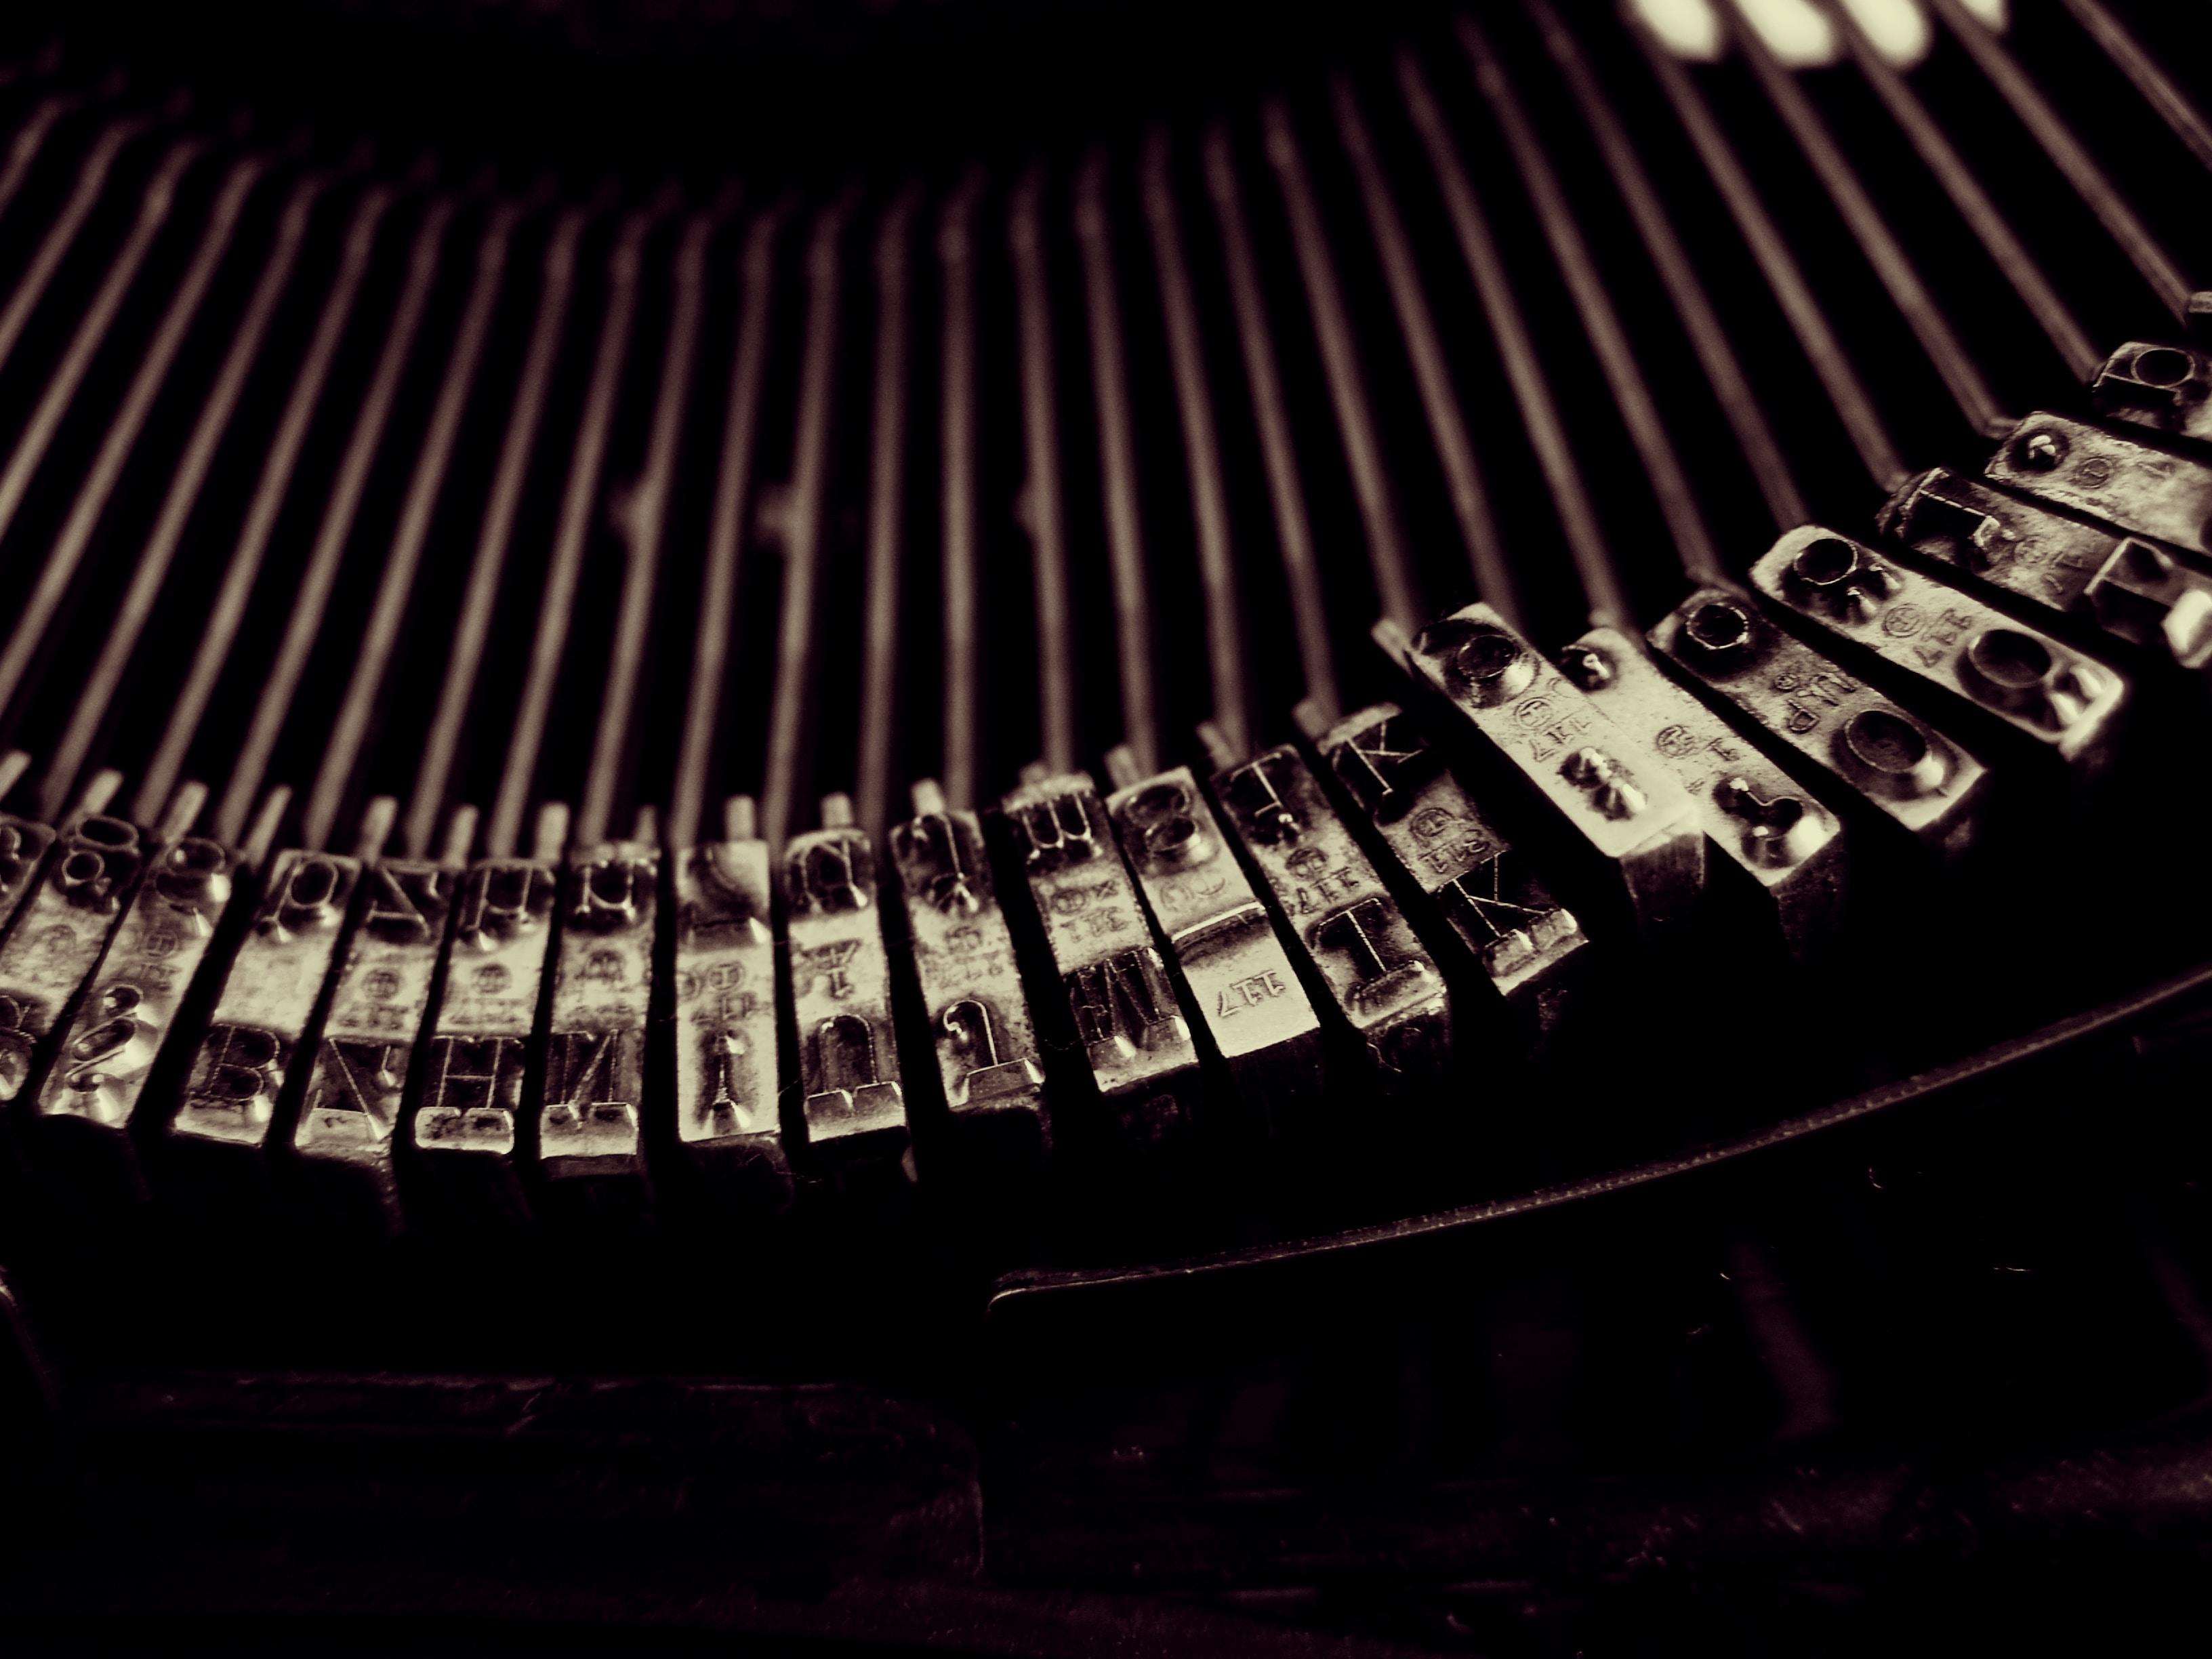 Close-up of typebars in a typewriter